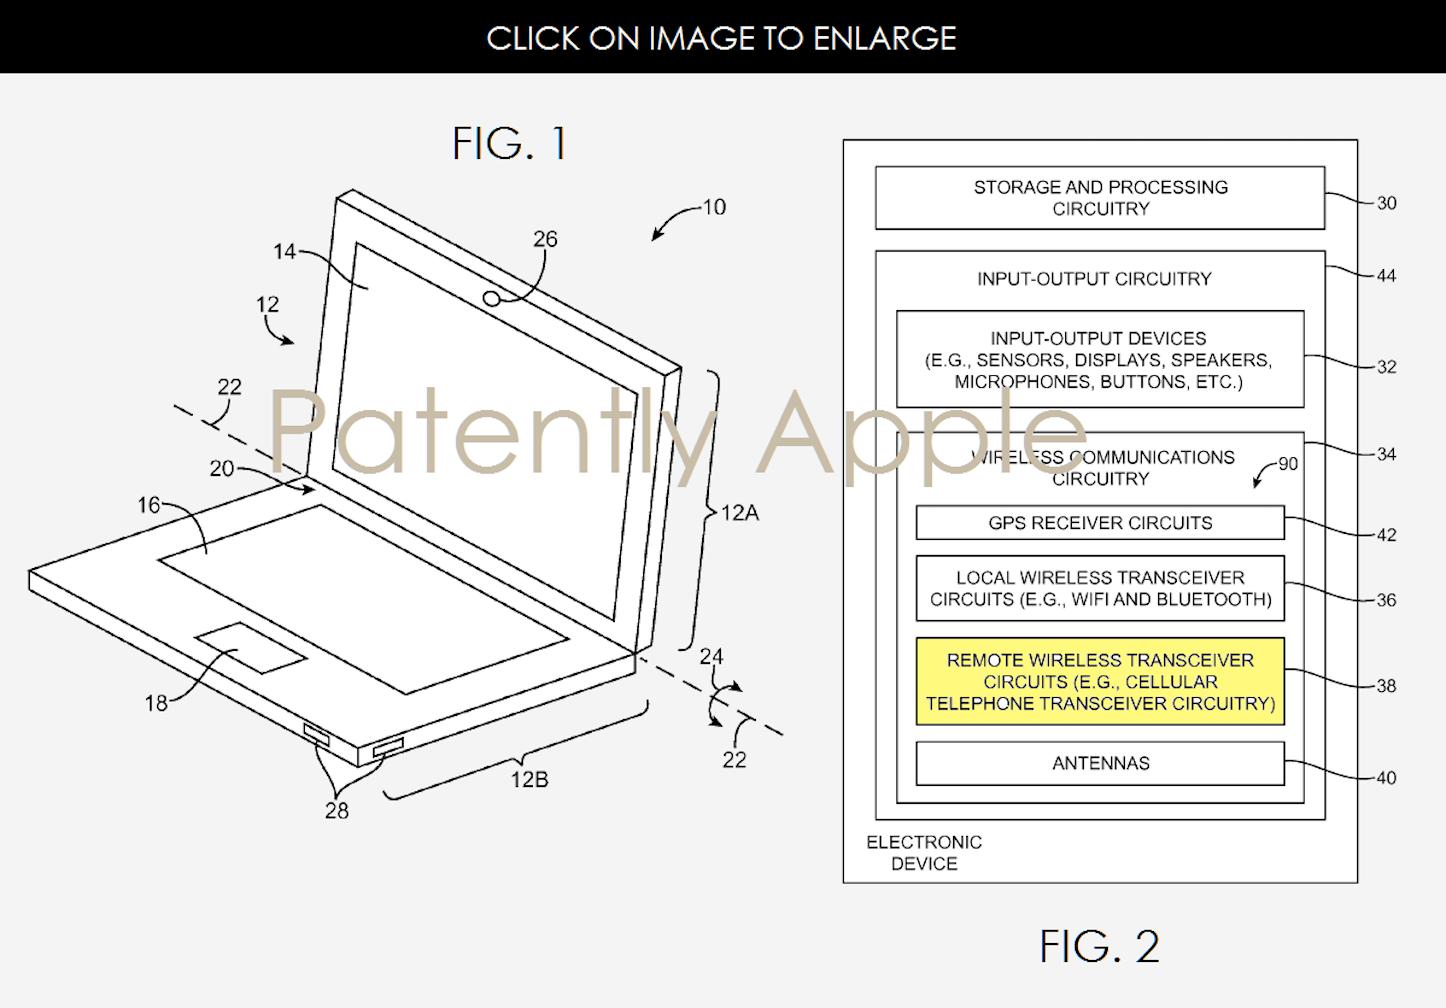 Cellular-MacBook-Patent.png